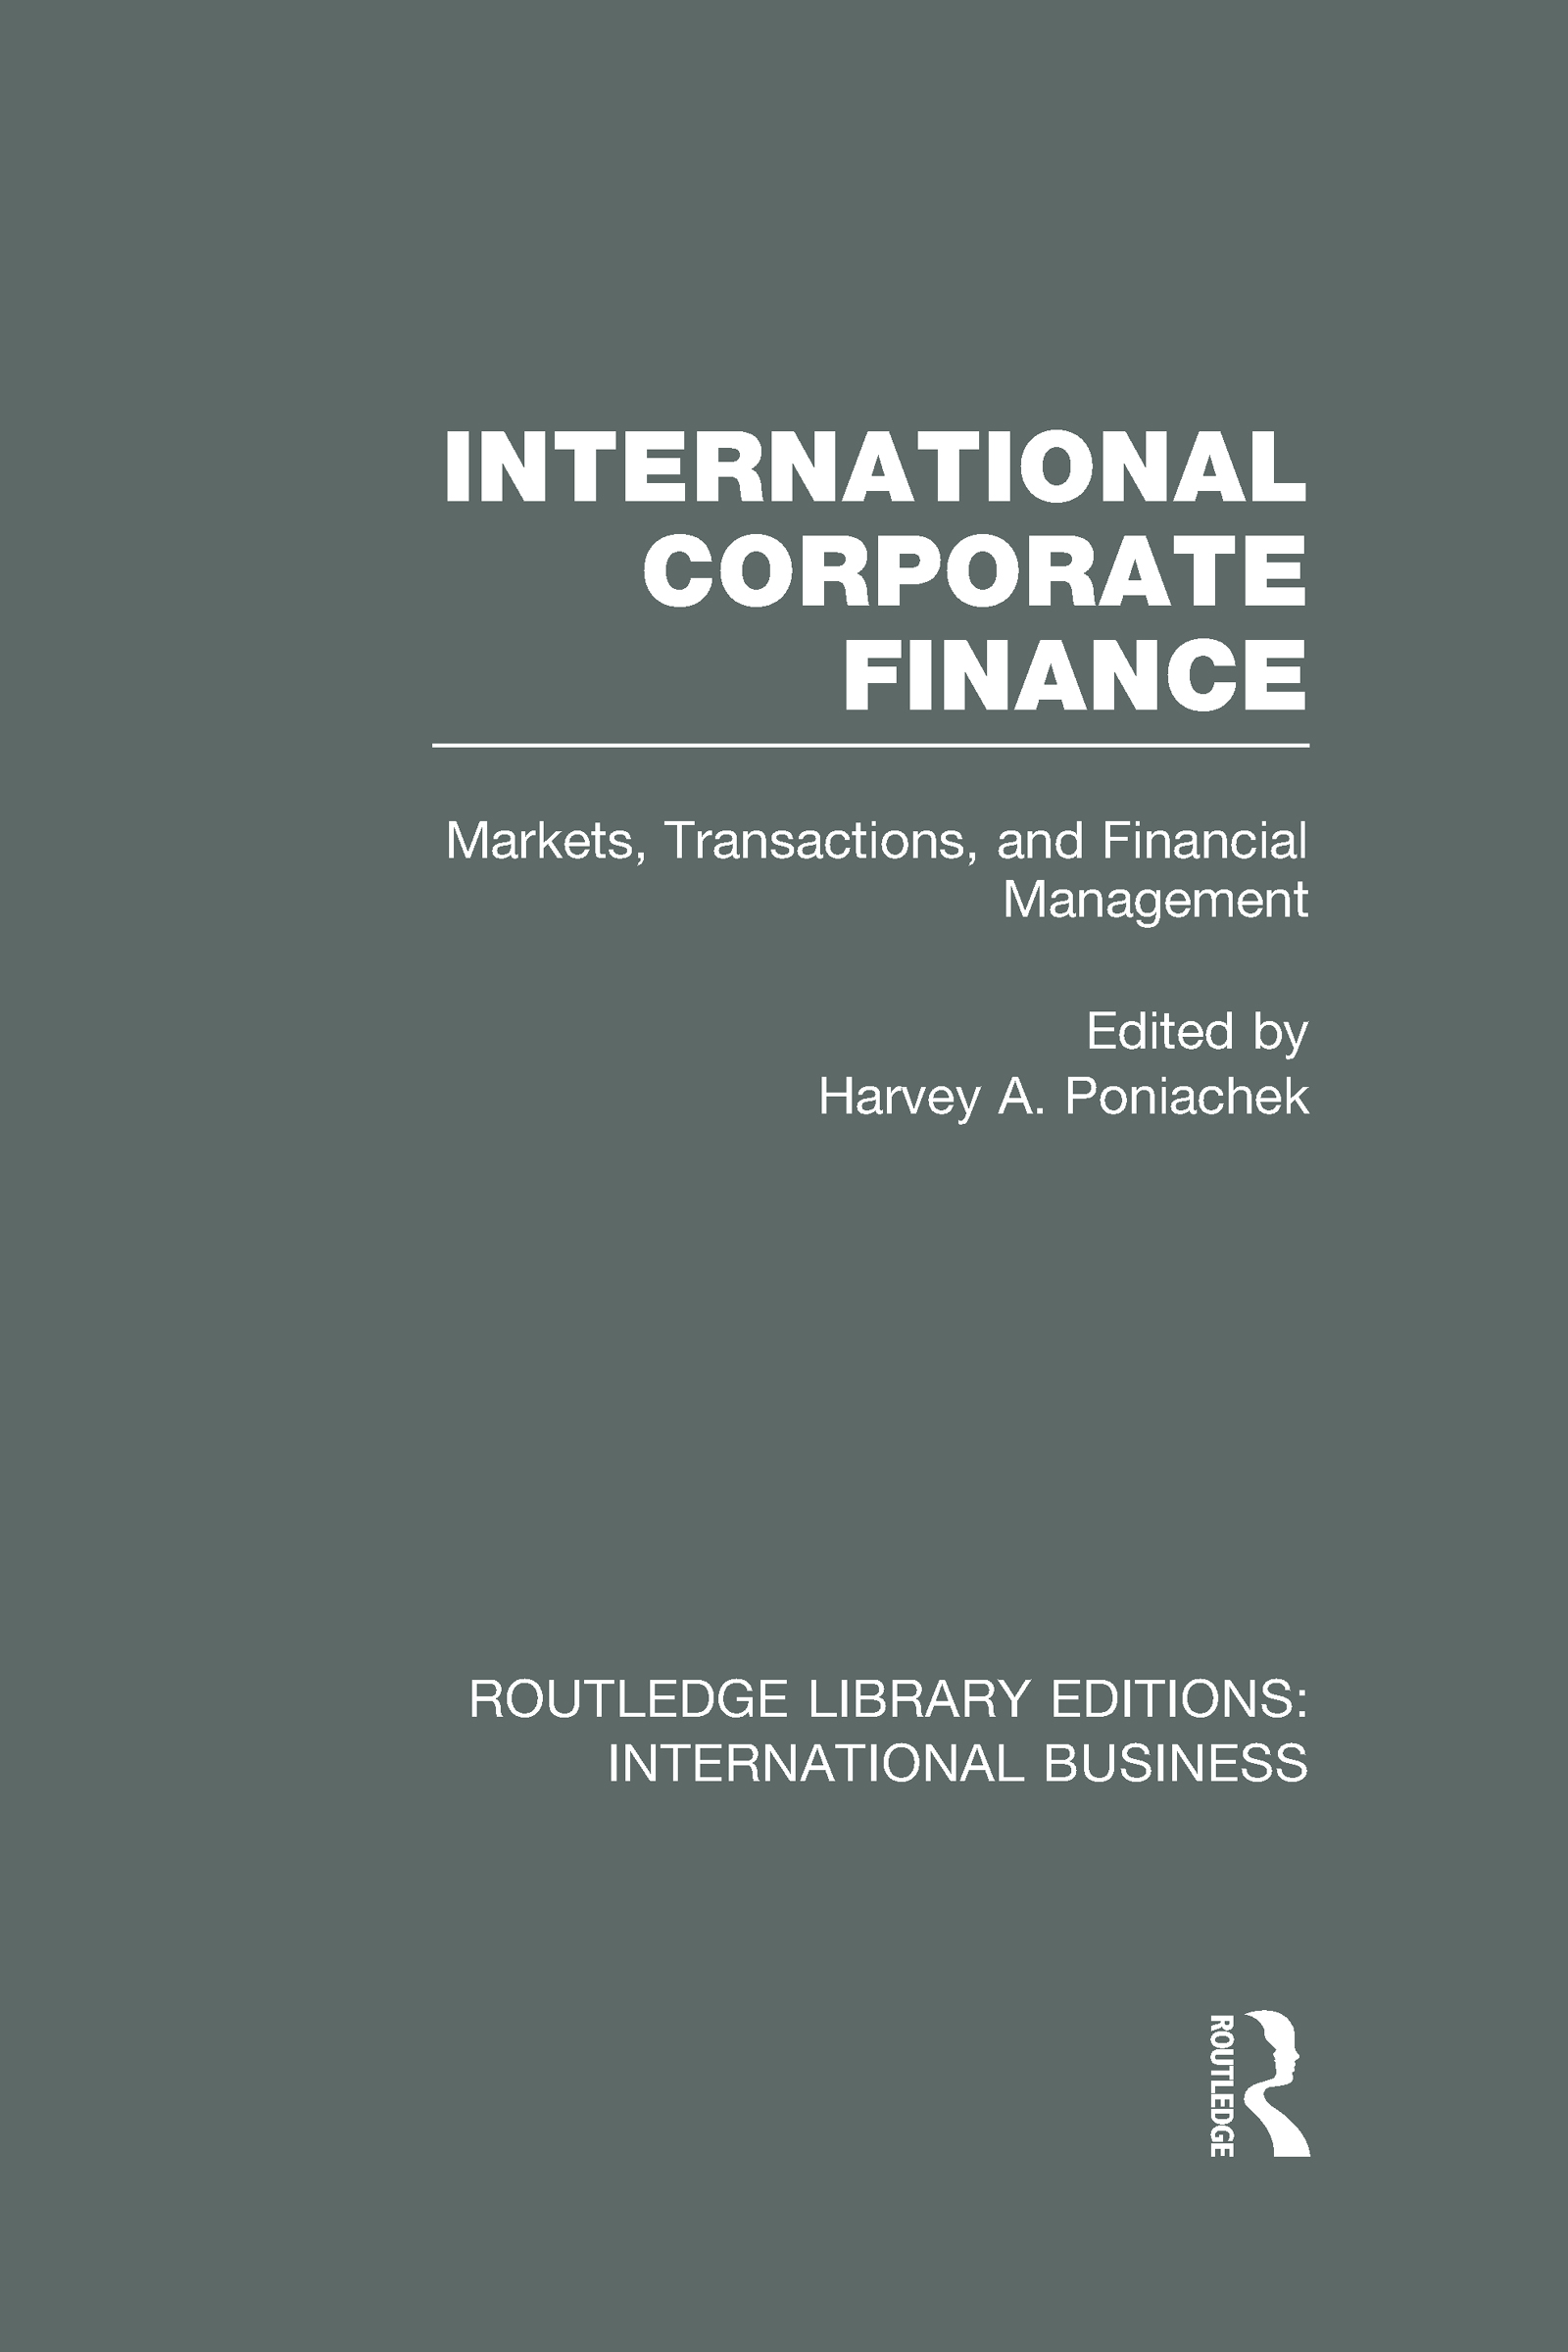 International Corporate Finance (RLE International Business): Markets, Transactions and Financial Management (Hardback) book cover